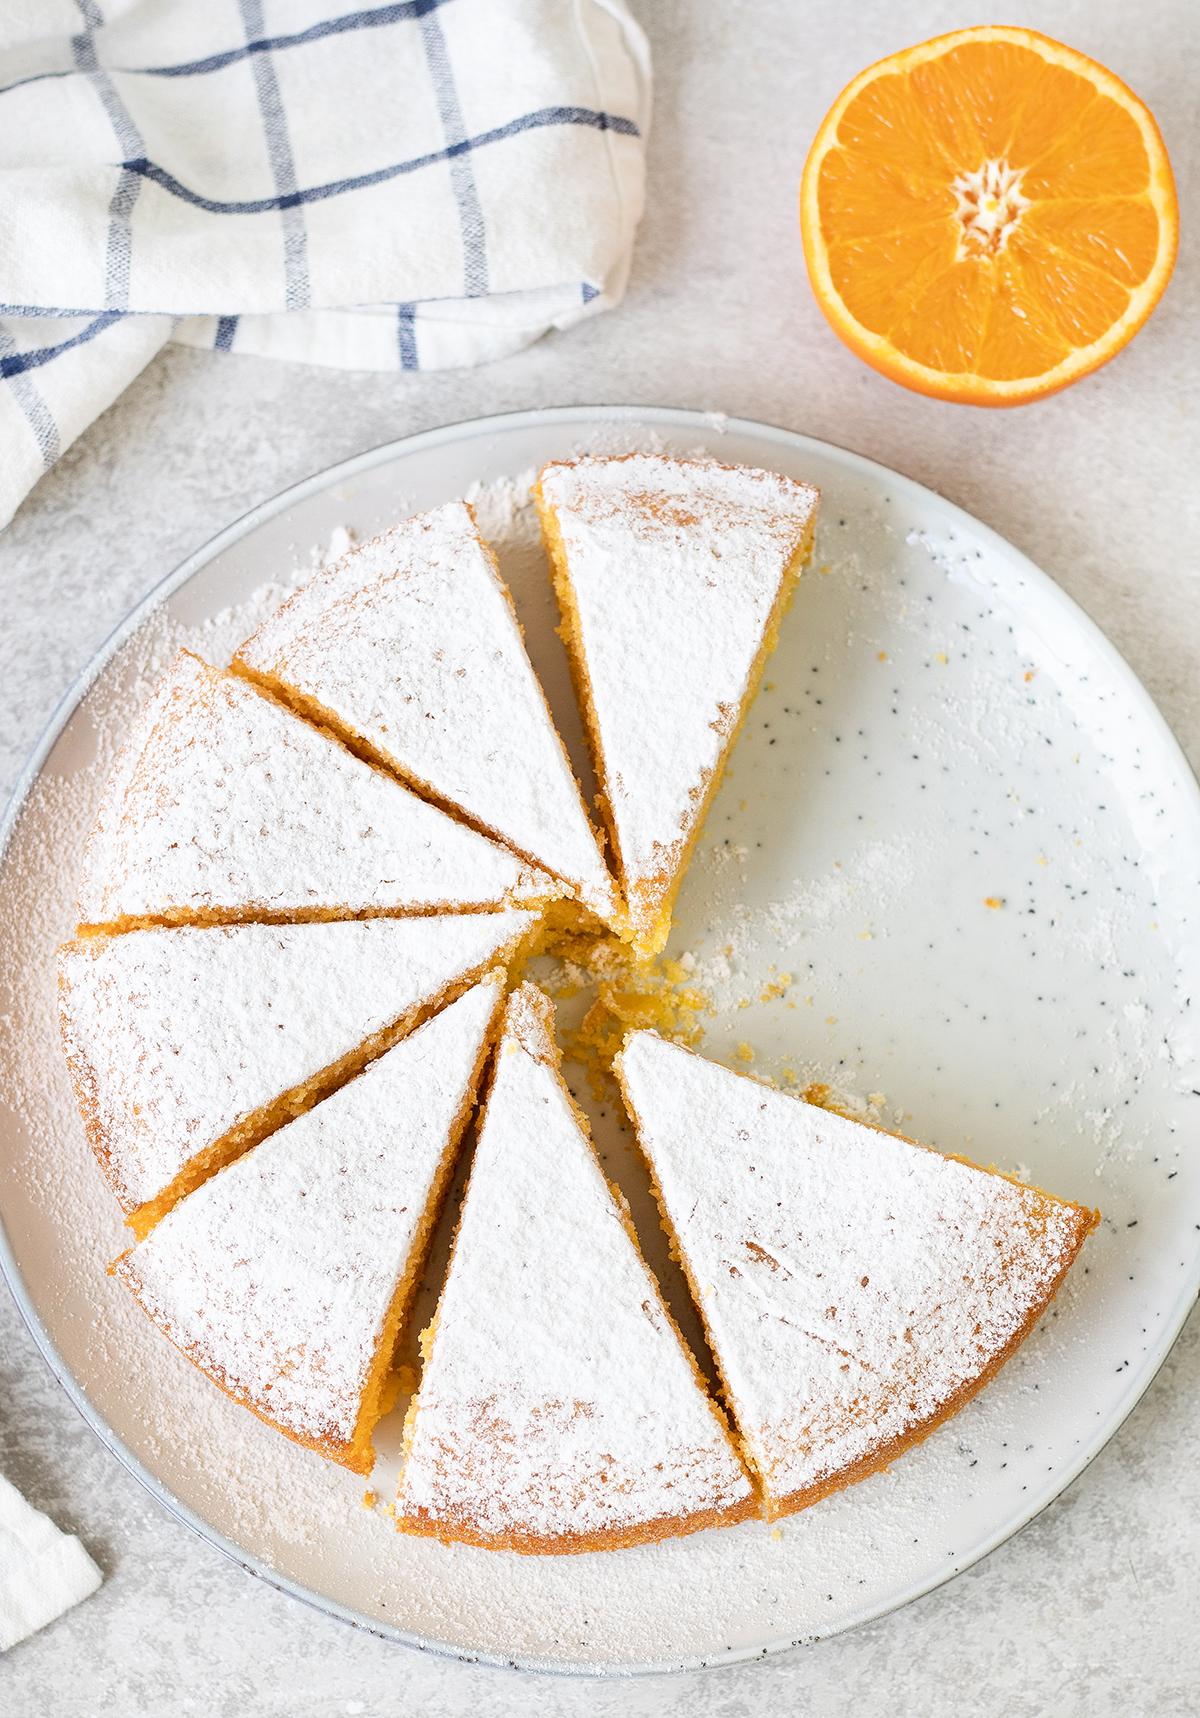 Polenta Cake is a simple Italian-style cake